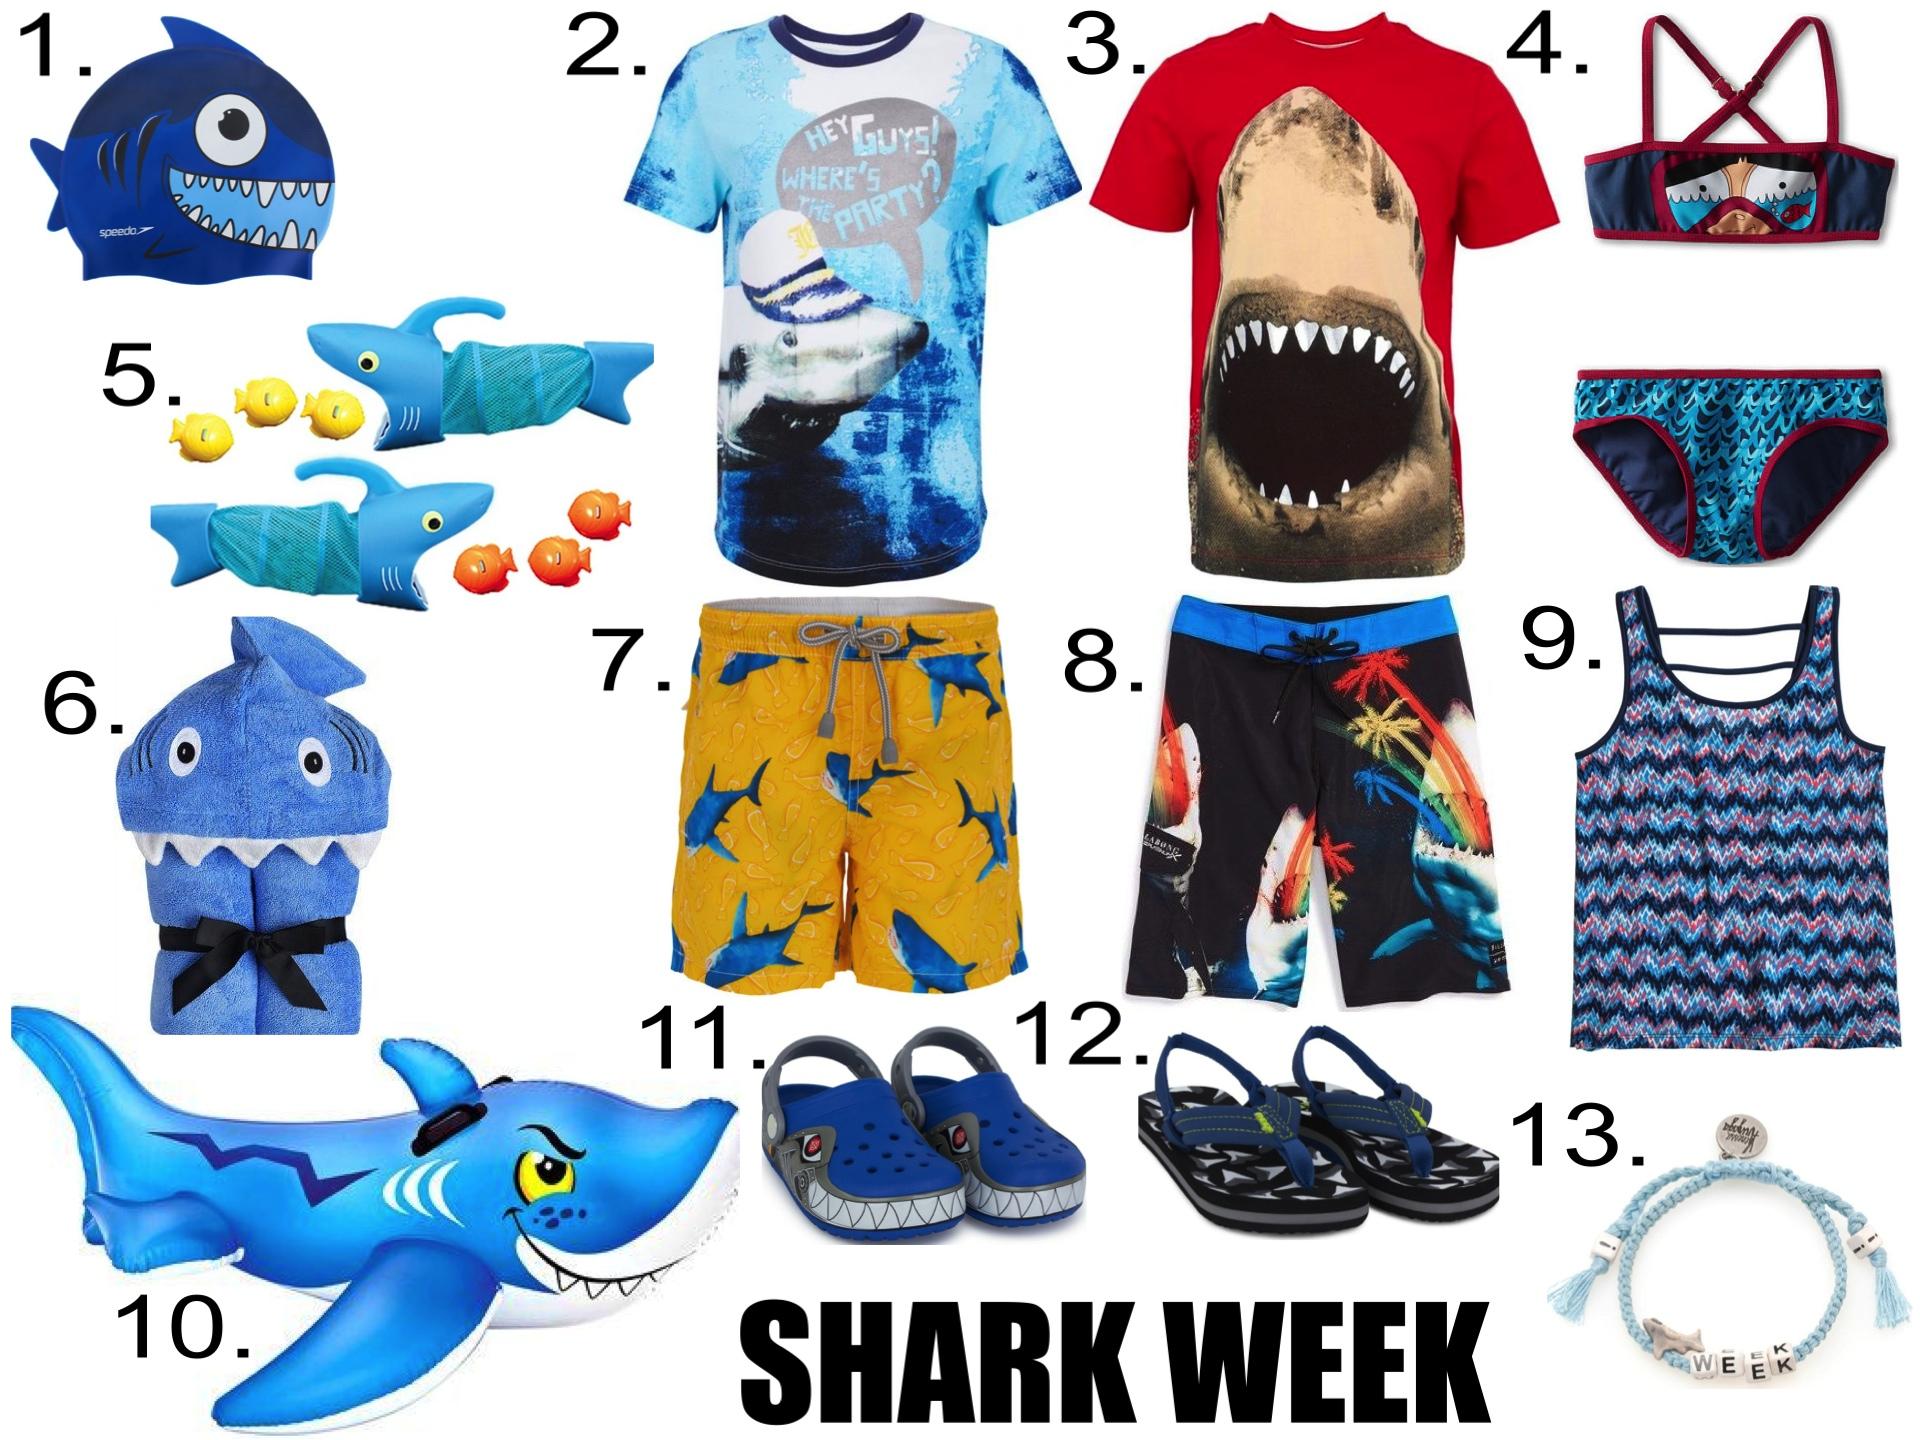 In the Water...  1.  JUNIOR SPEEDO SHARK CAP  2.  John Galliano Shark Print Tee  3.  Diesel Shark Tee  4.  Little Marc Jacobs Bikini Set  5.  Melissa & Doug Shark Hunt Toy  6.  Yikes Twins Child Hooded Towel  7.  MC2 St Barth Shark Print Swim Shorts  8.  'PX3 Carnivorous' Stretch Board Shorts  9.  ROXY GIRLS TANK  10.  Intex Friendly Shark Ride-On  11.  Robo Shark Light Up Crocs   12.     Reef Shark Fin Ahi Sandals   13.    VENESSA ARIZAGA 'Shark Week' bracelet